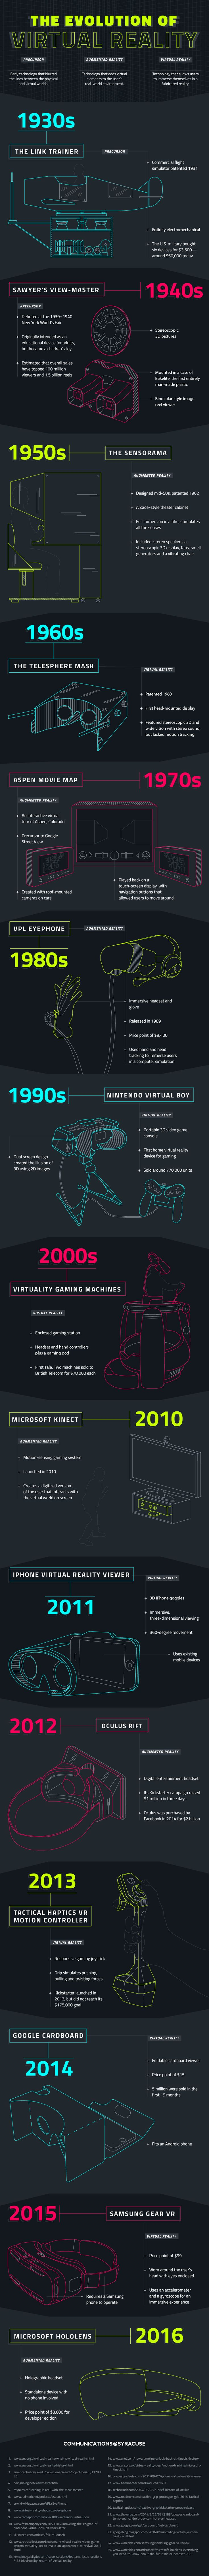 VRJournal Highlights The Evolution of Virtual Reality #MobileTech #Mobile #tech